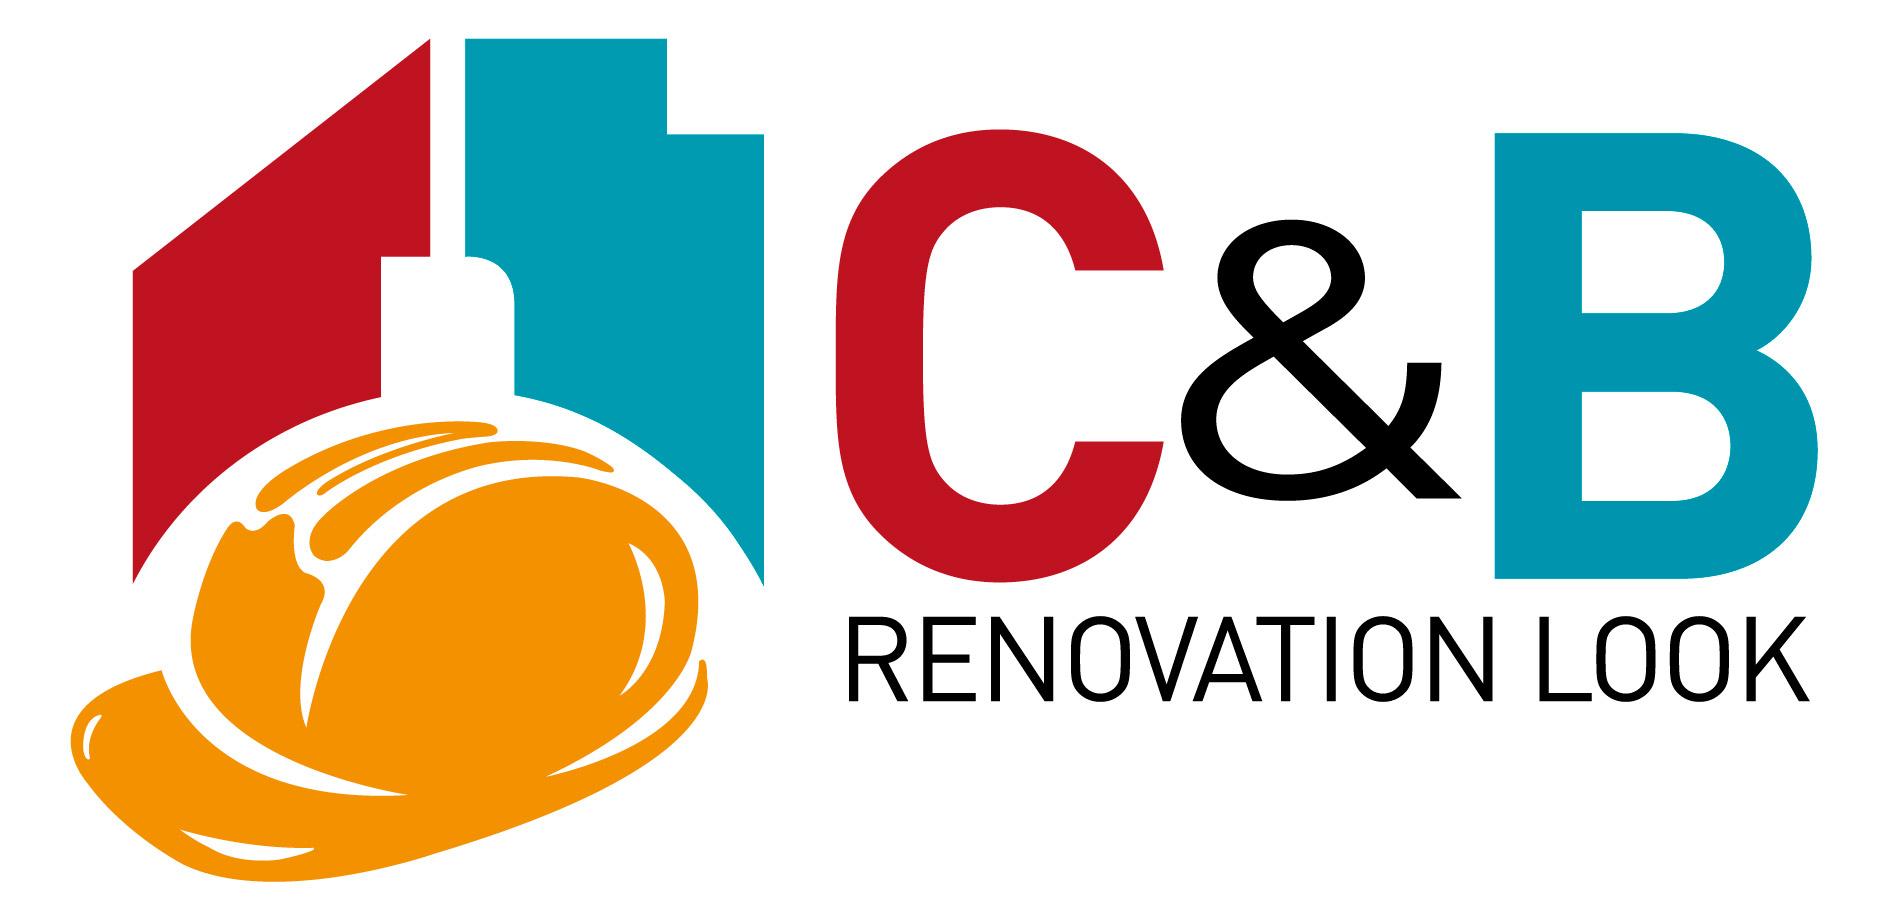 C&B Renovation Look